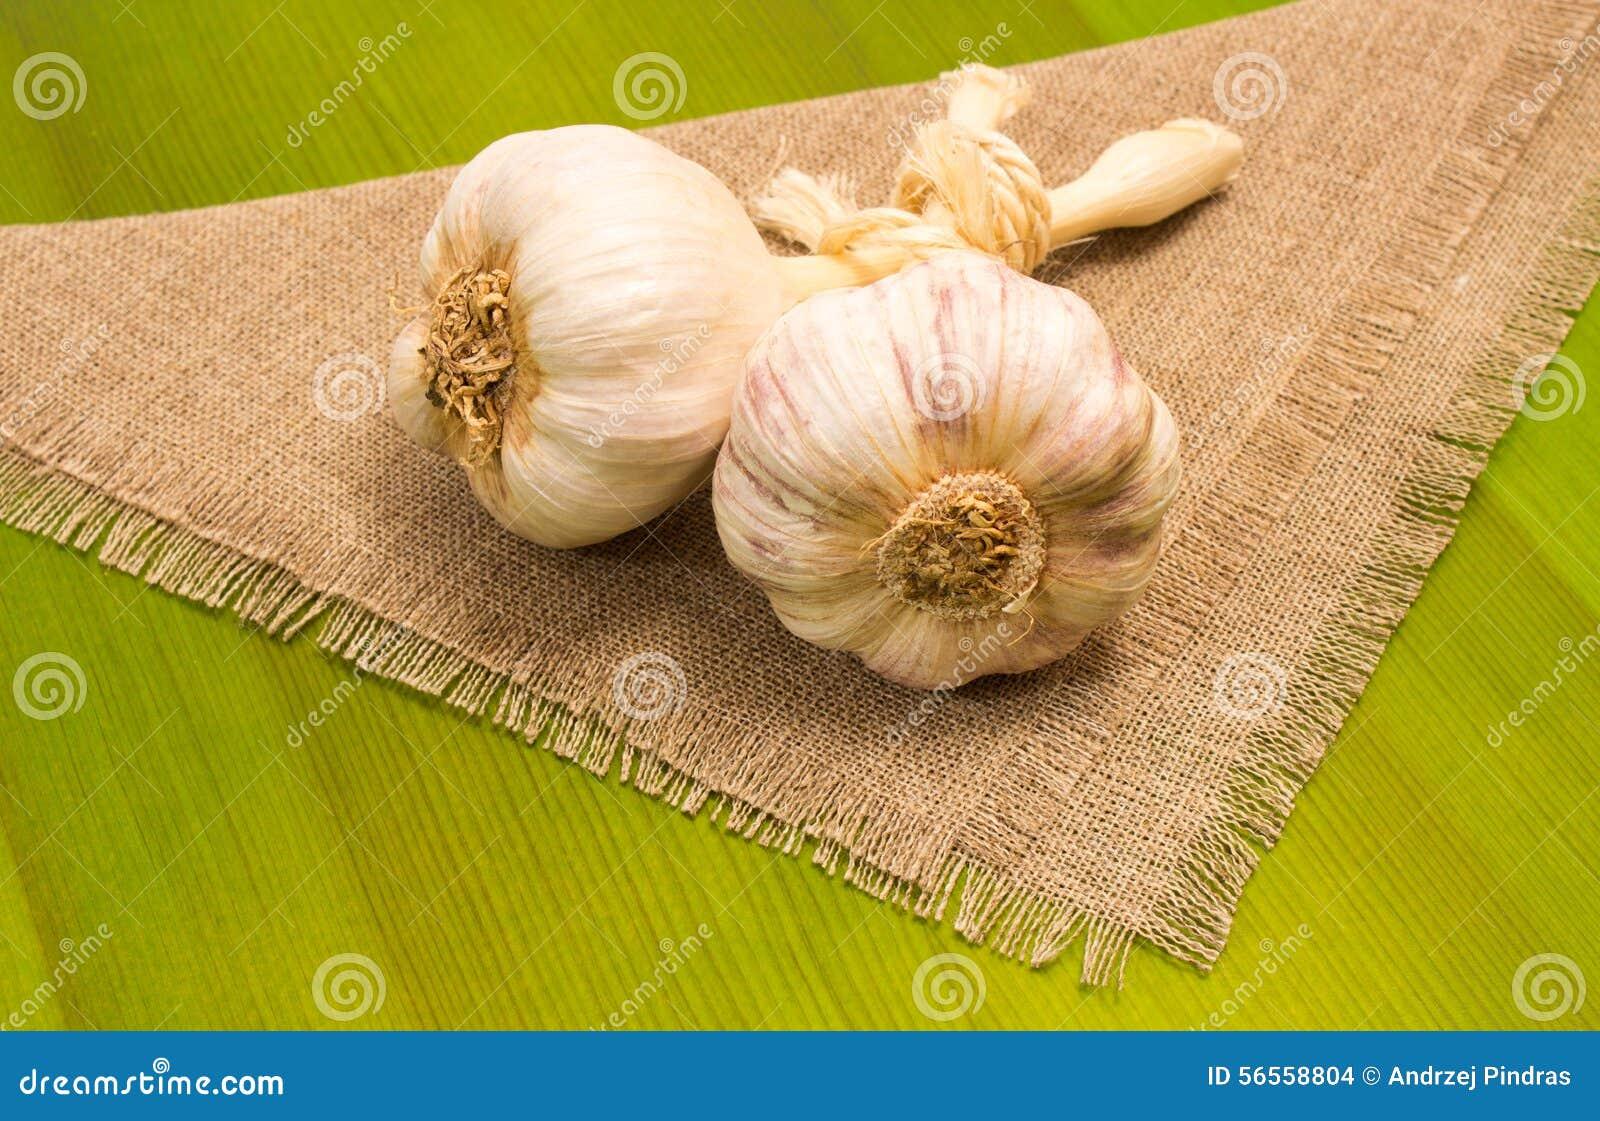 Download Φρέσκο σκόρδο πράσινο στενό σε επάνω πινάκων Στοκ Εικόνες - εικόνα από υγεία, dieting: 56558804